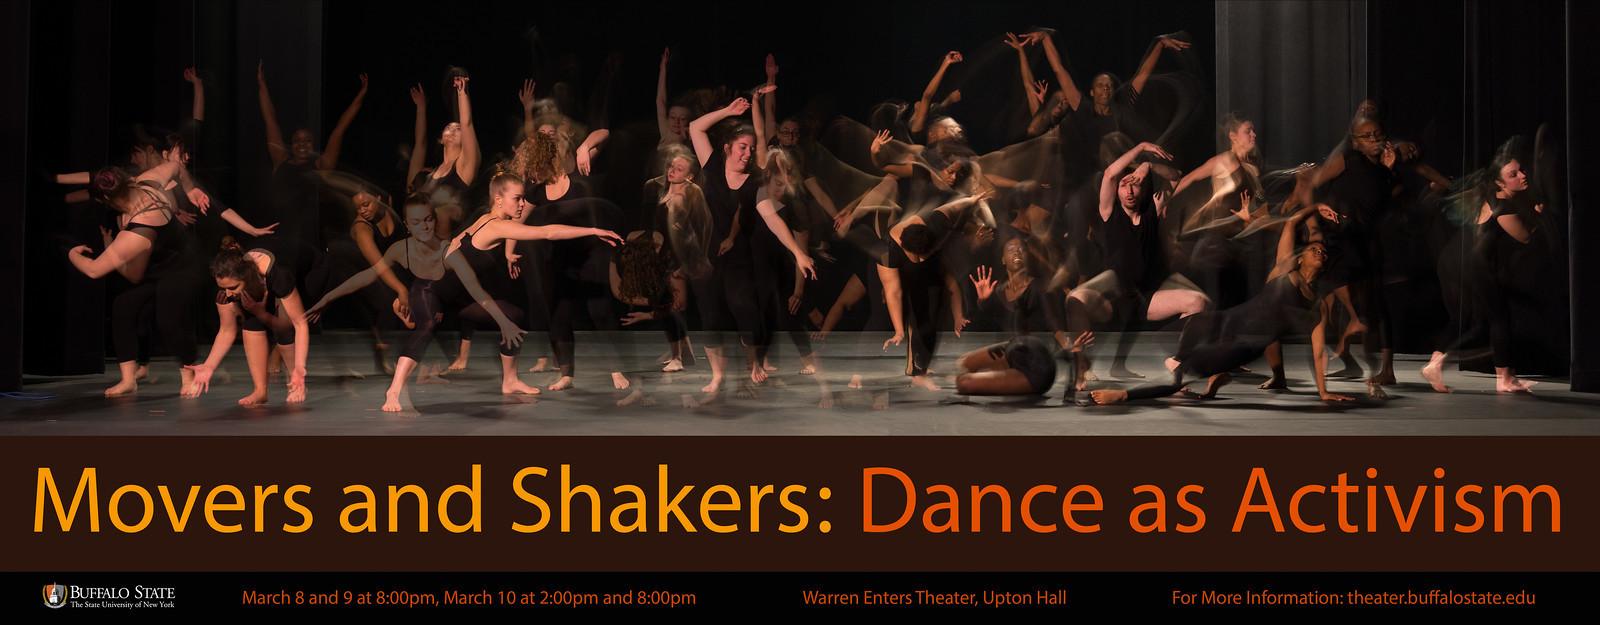 Dance poster banner 295 x3